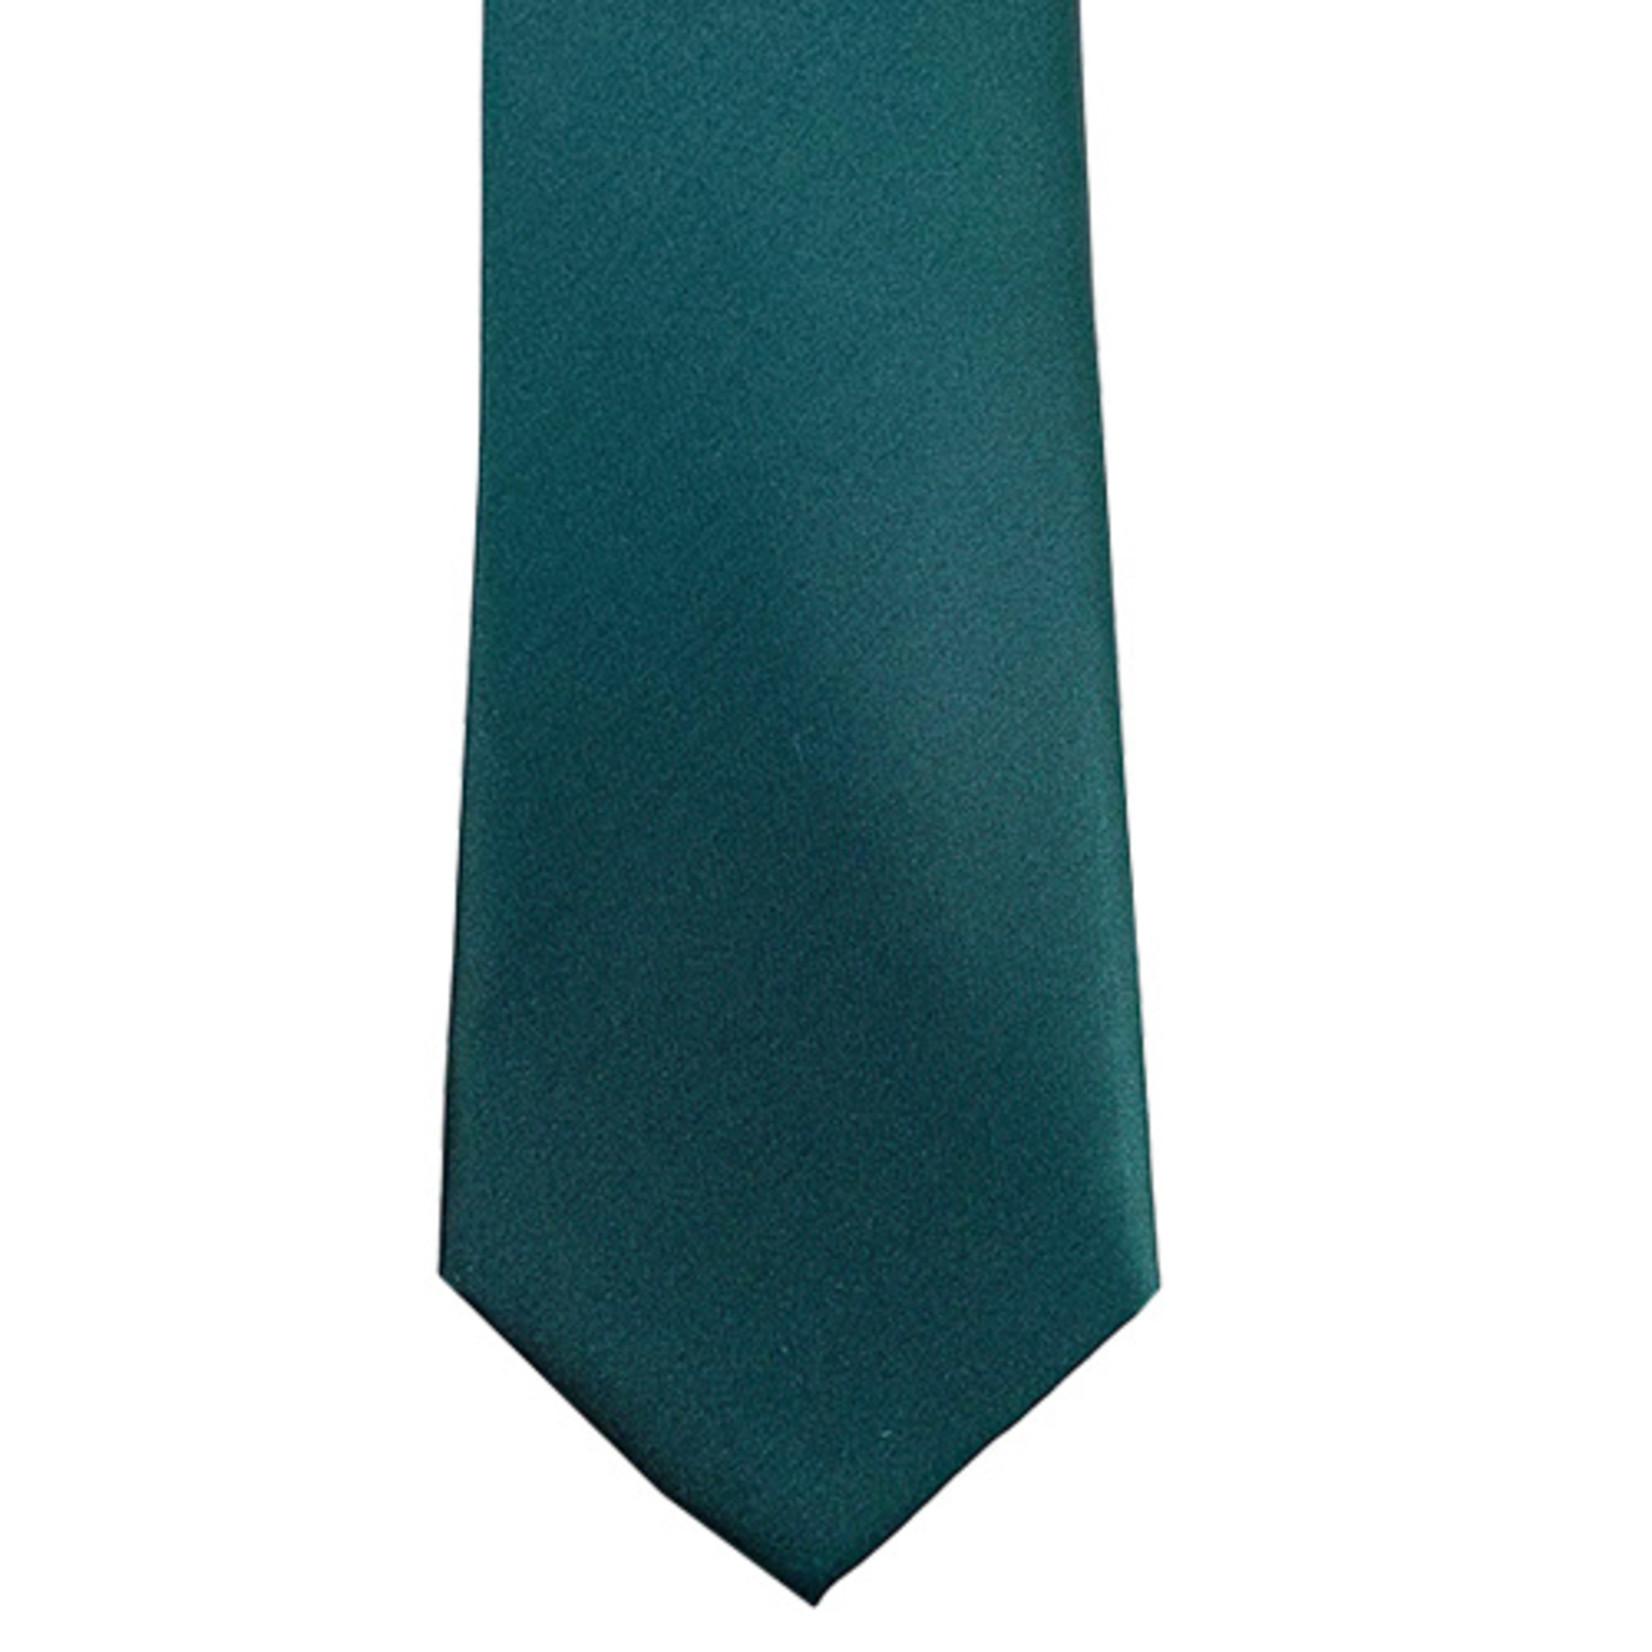 Knotz M100-45 Solid Dark Emerald Tie